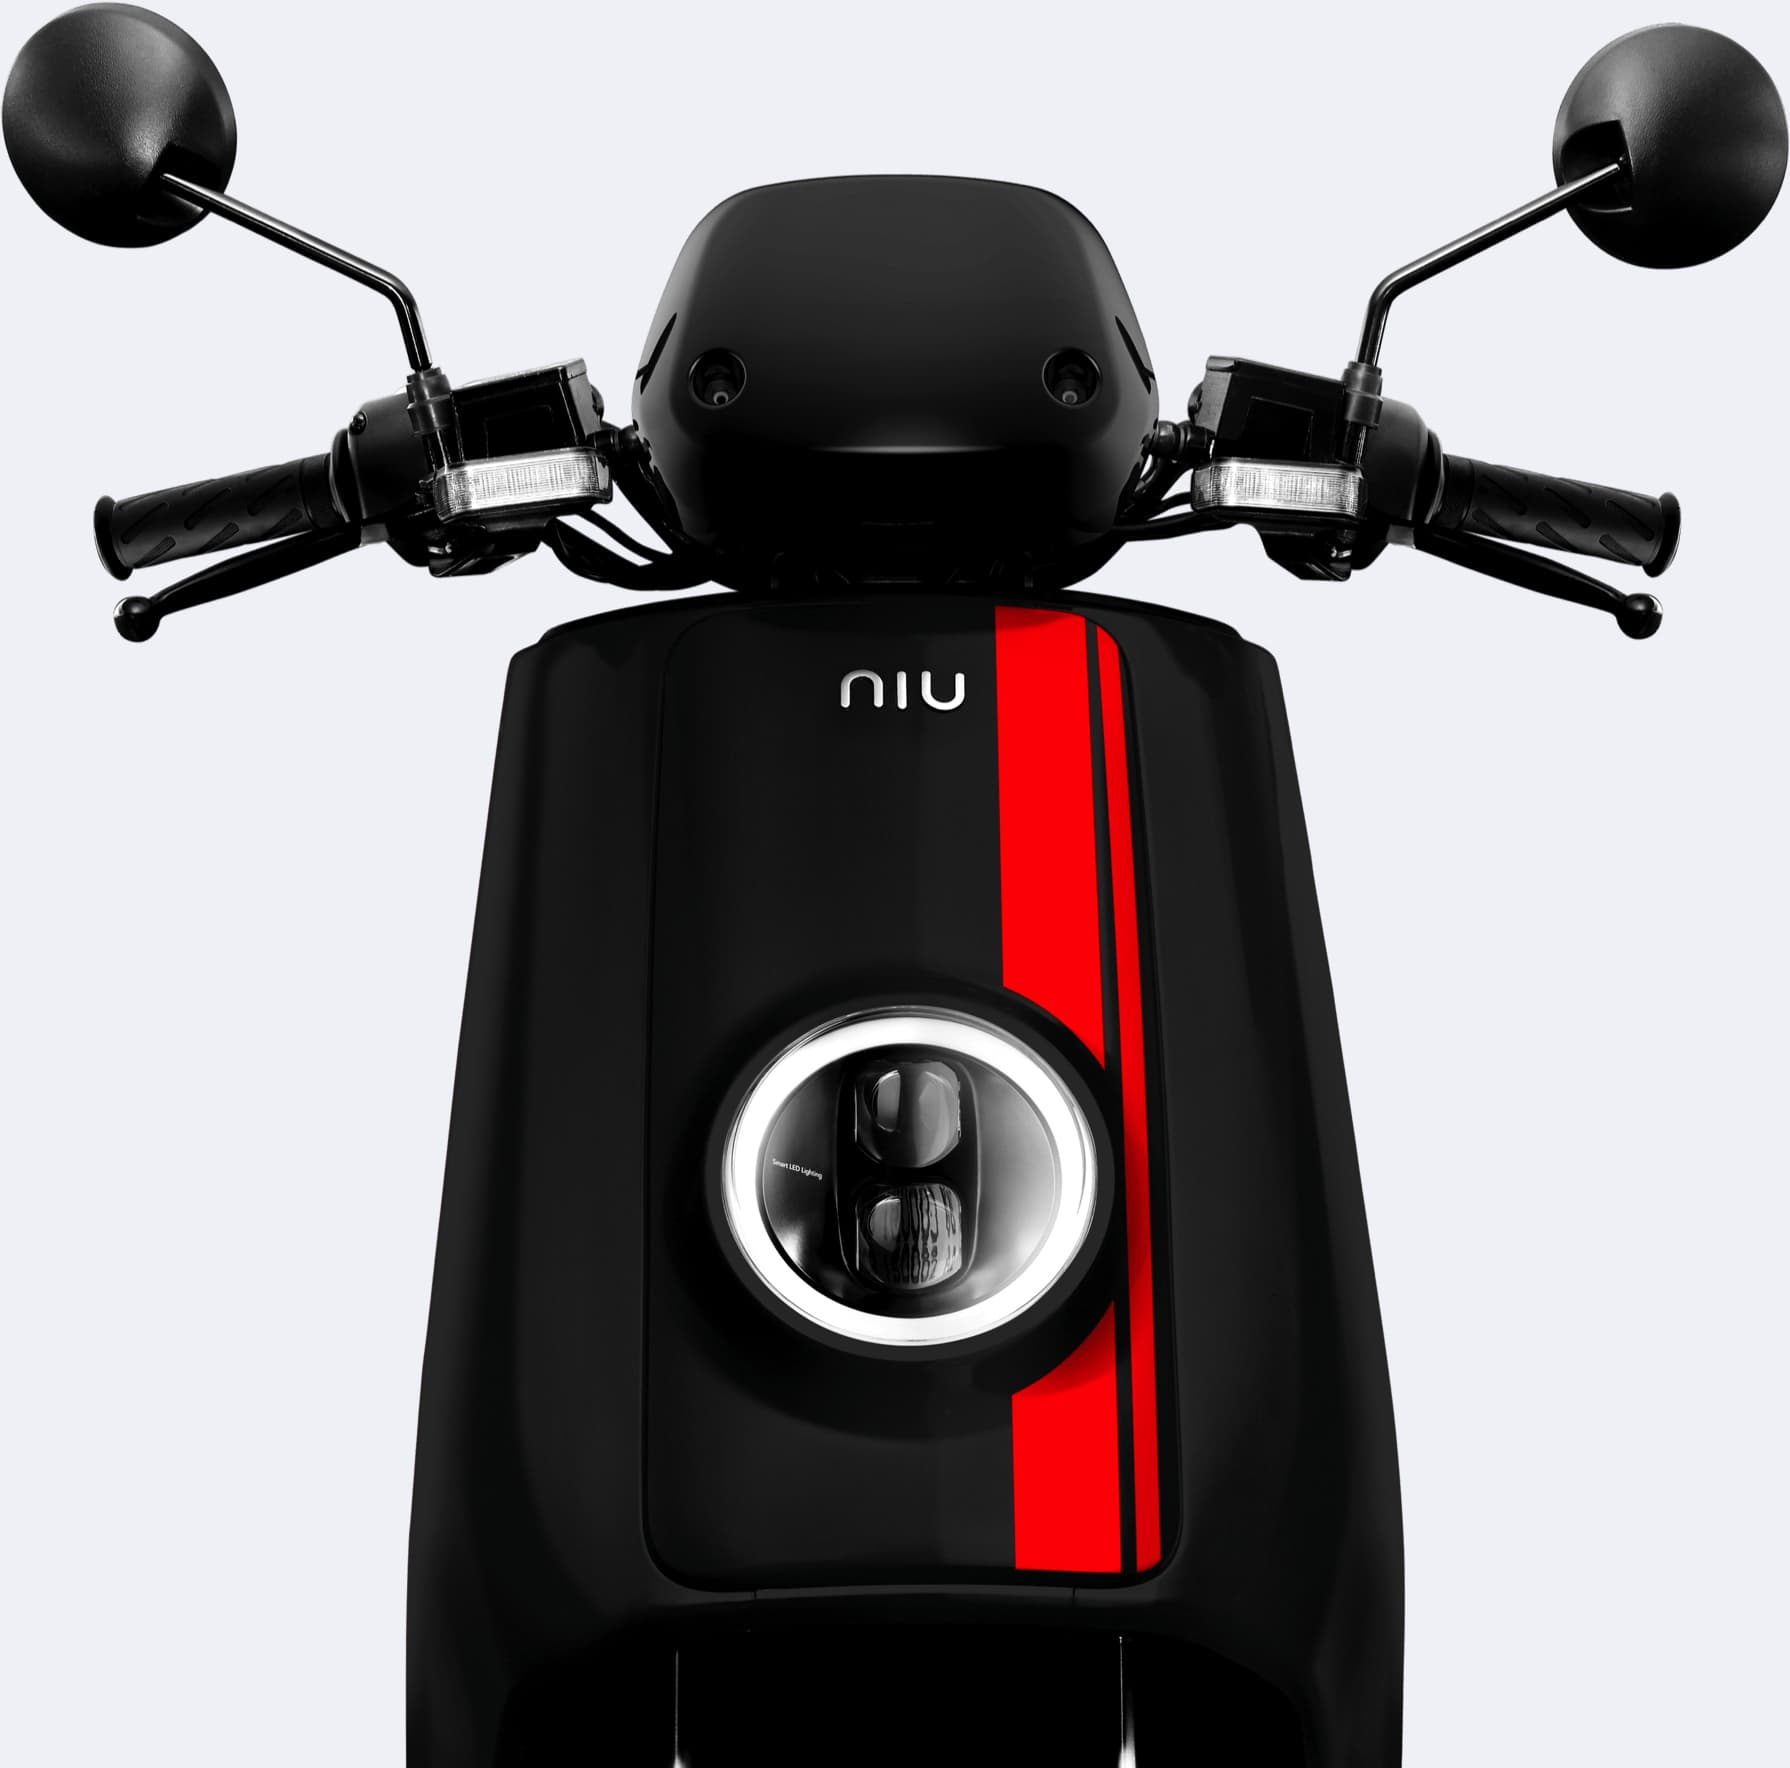 niu electic scooter design